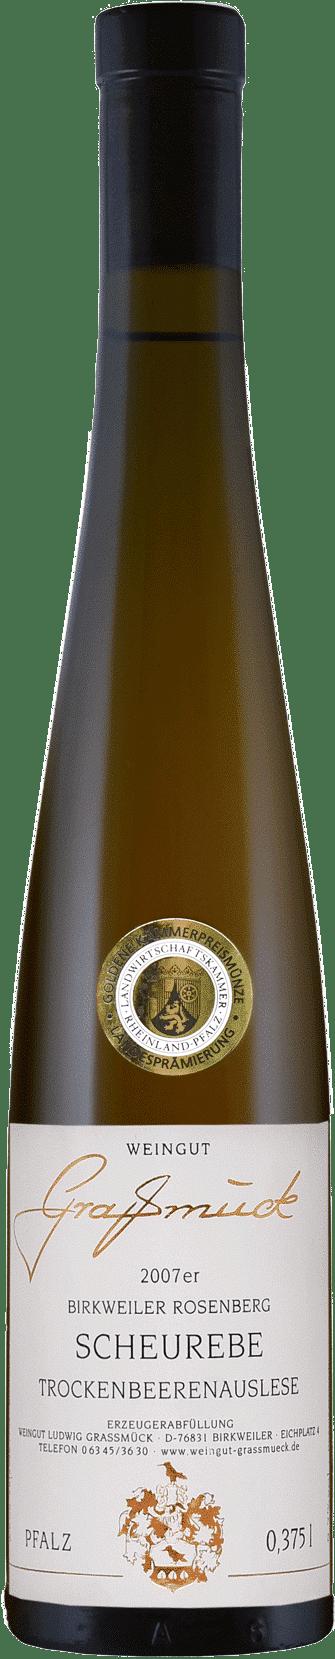 Weingut Ludwig Graßmück, Simon Graßmück, Scheurebe Trockenbeerenauslese